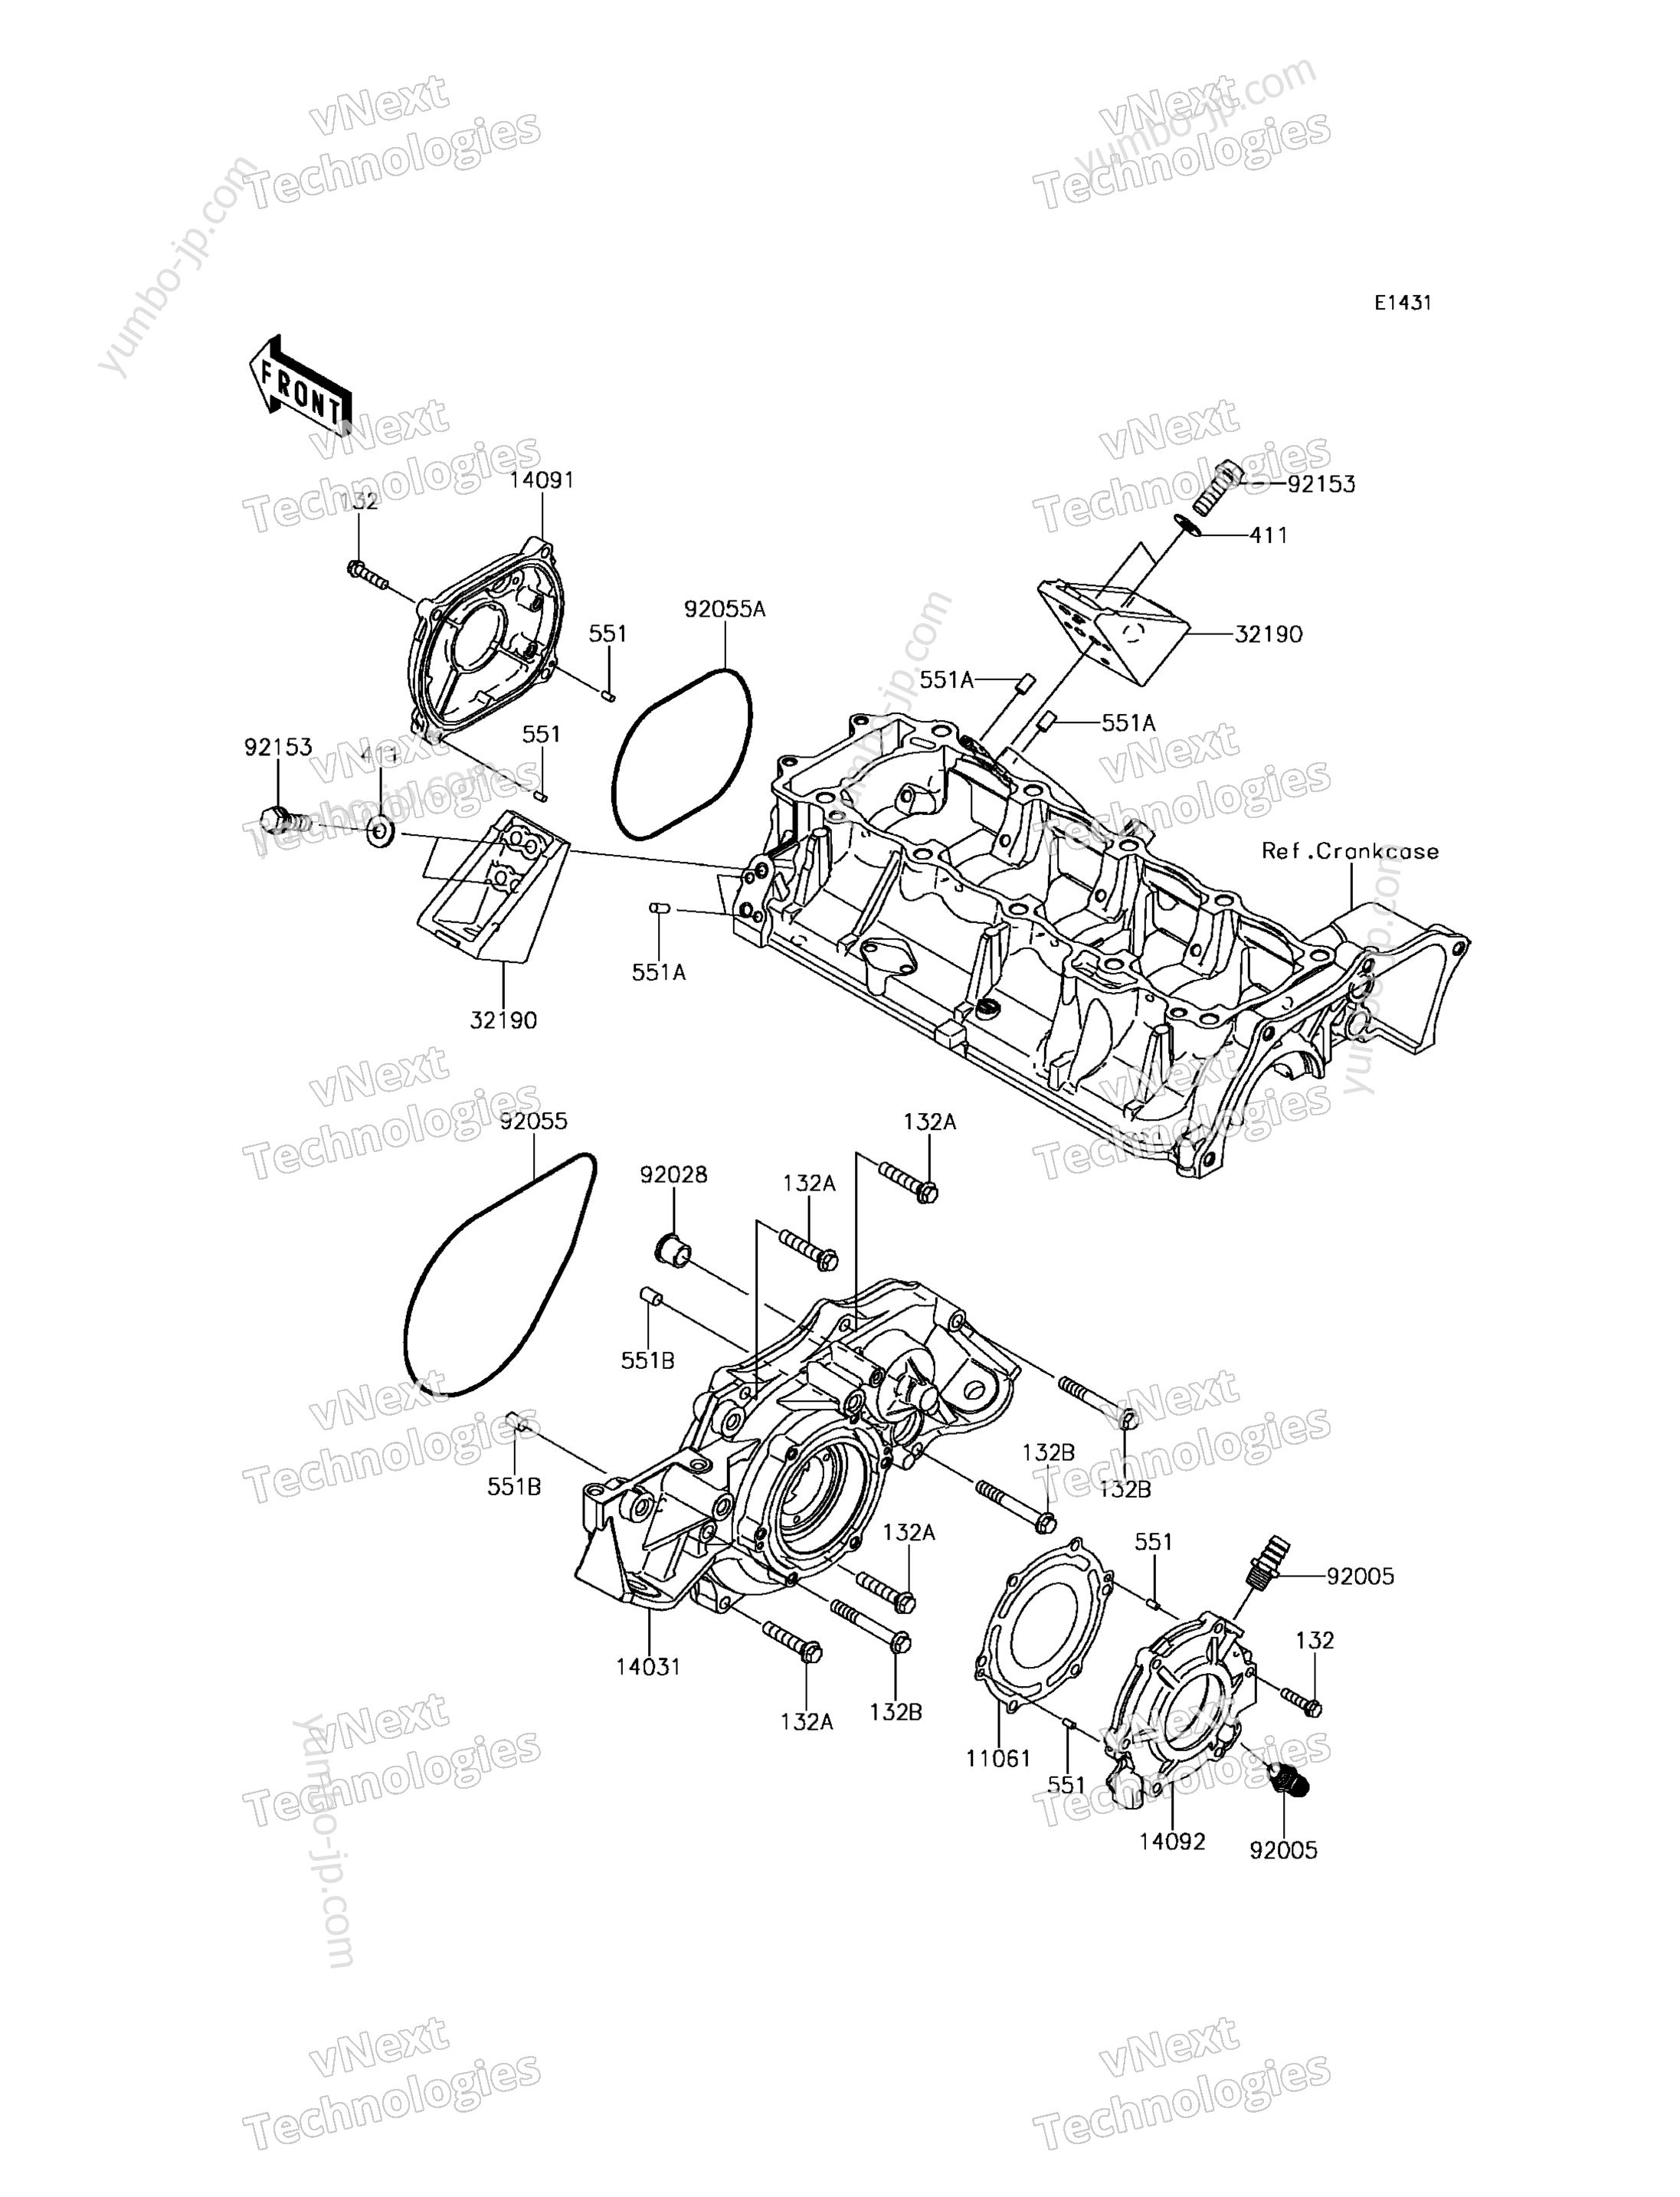 Engine Cover(s) для гидроцикла KAWASAKI JET SKI ULTRA 310X (JT1500PGF) 2016 г.